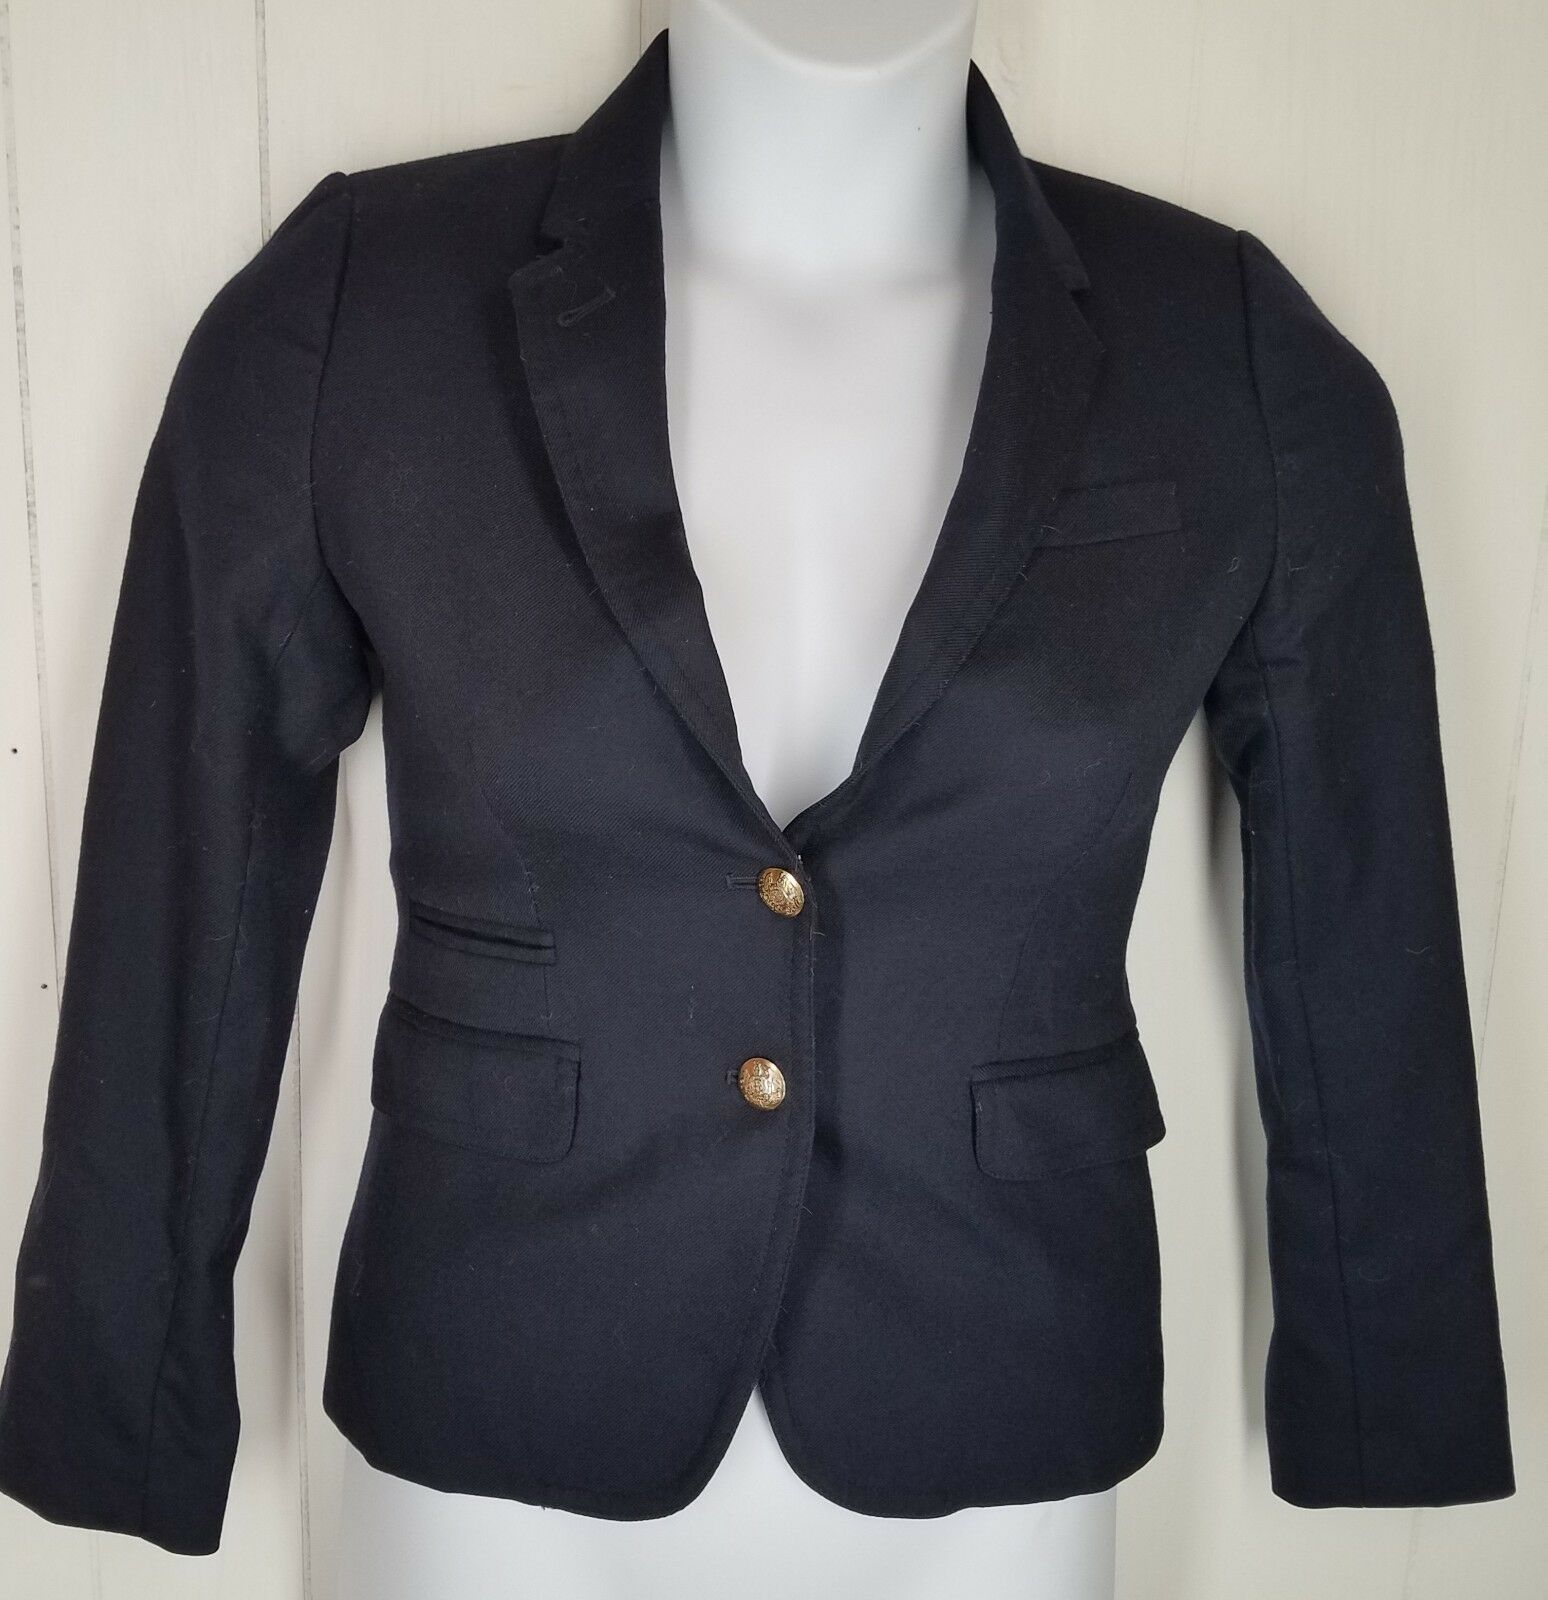 J.Crew Classic schoolboy blazer in navy size 0 womens gold button wool blend